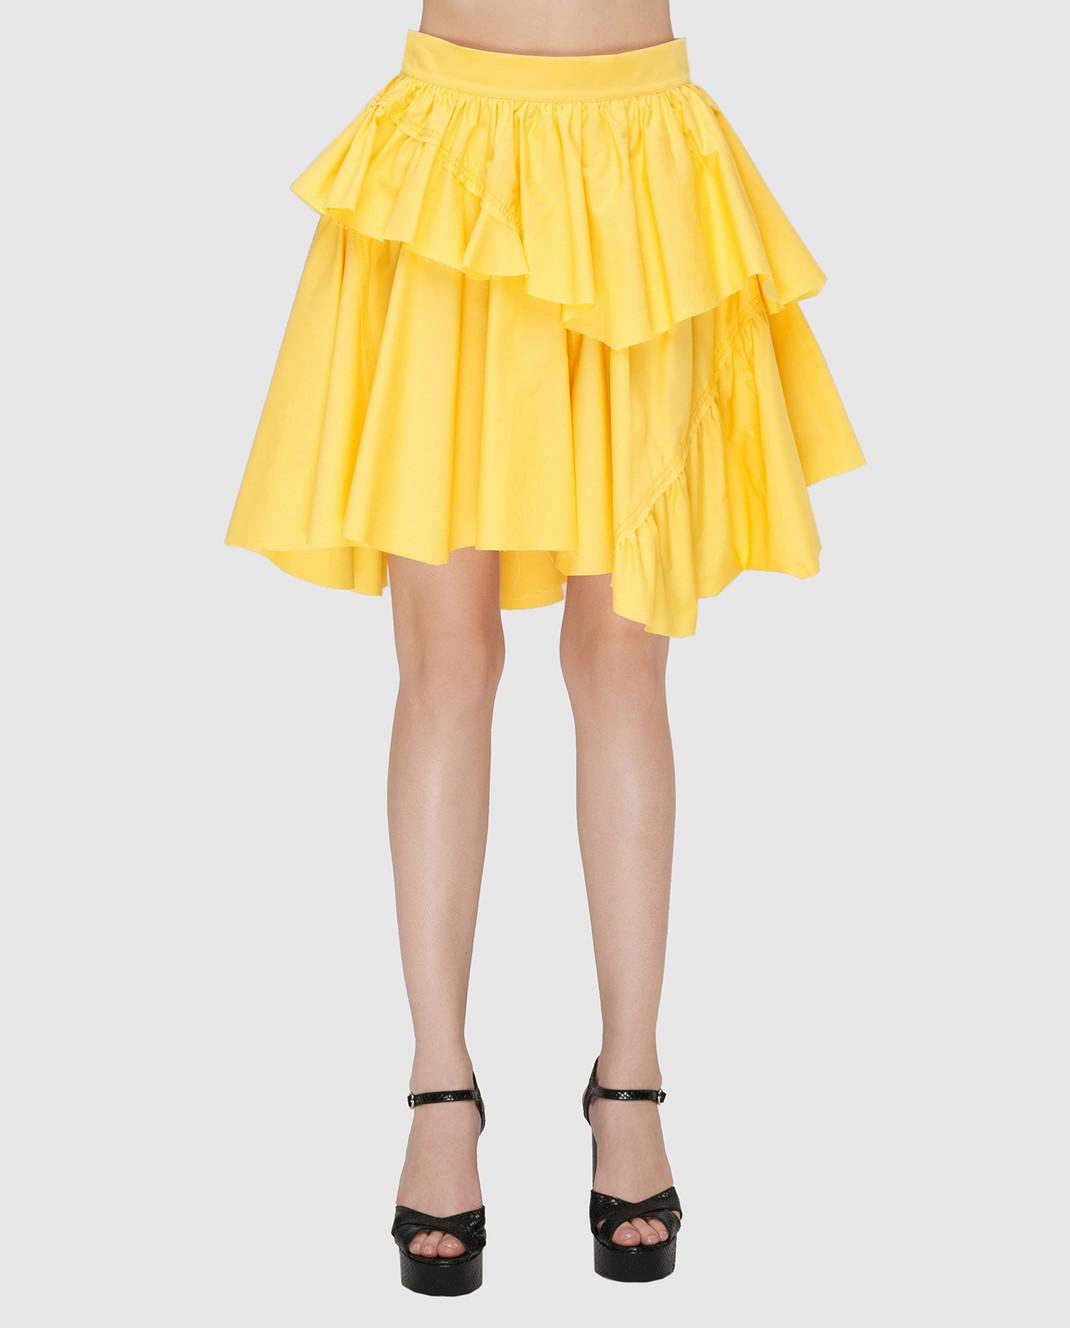 Philosophy di Lorenzo Serafini Желтая юбка A01042143 изображение 3